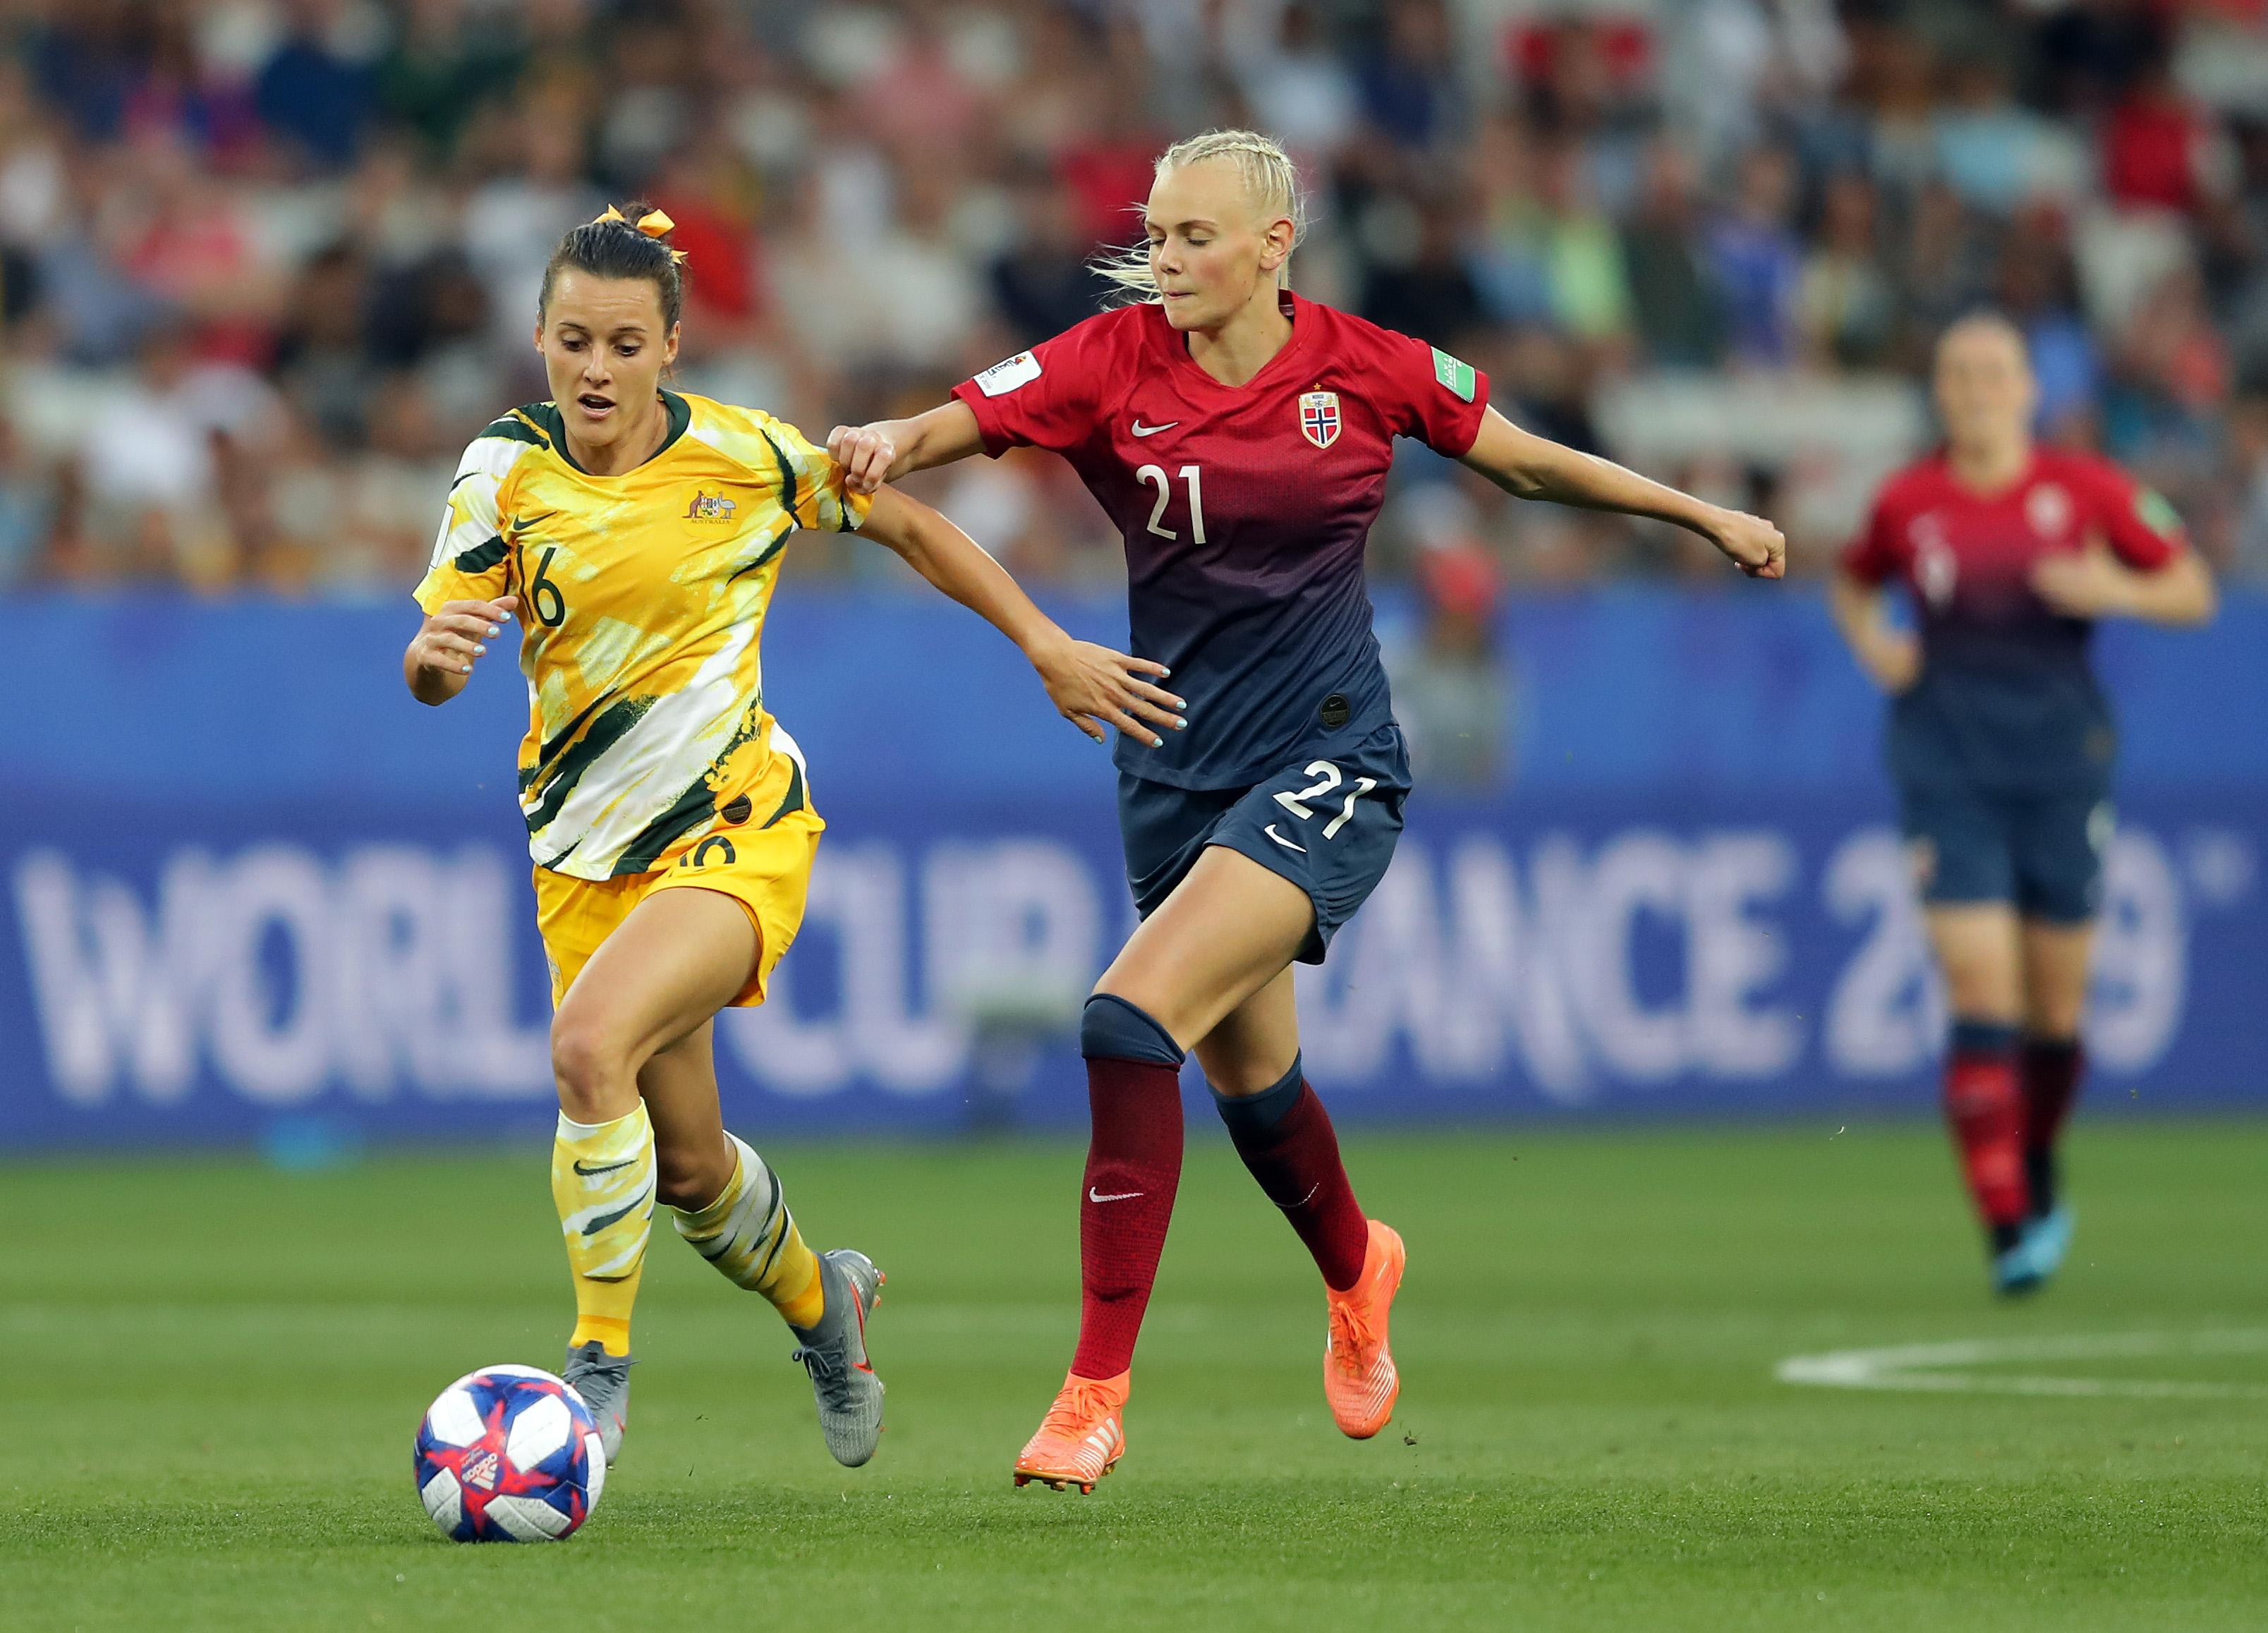 Everton Women sign Australian international Hayley Raso